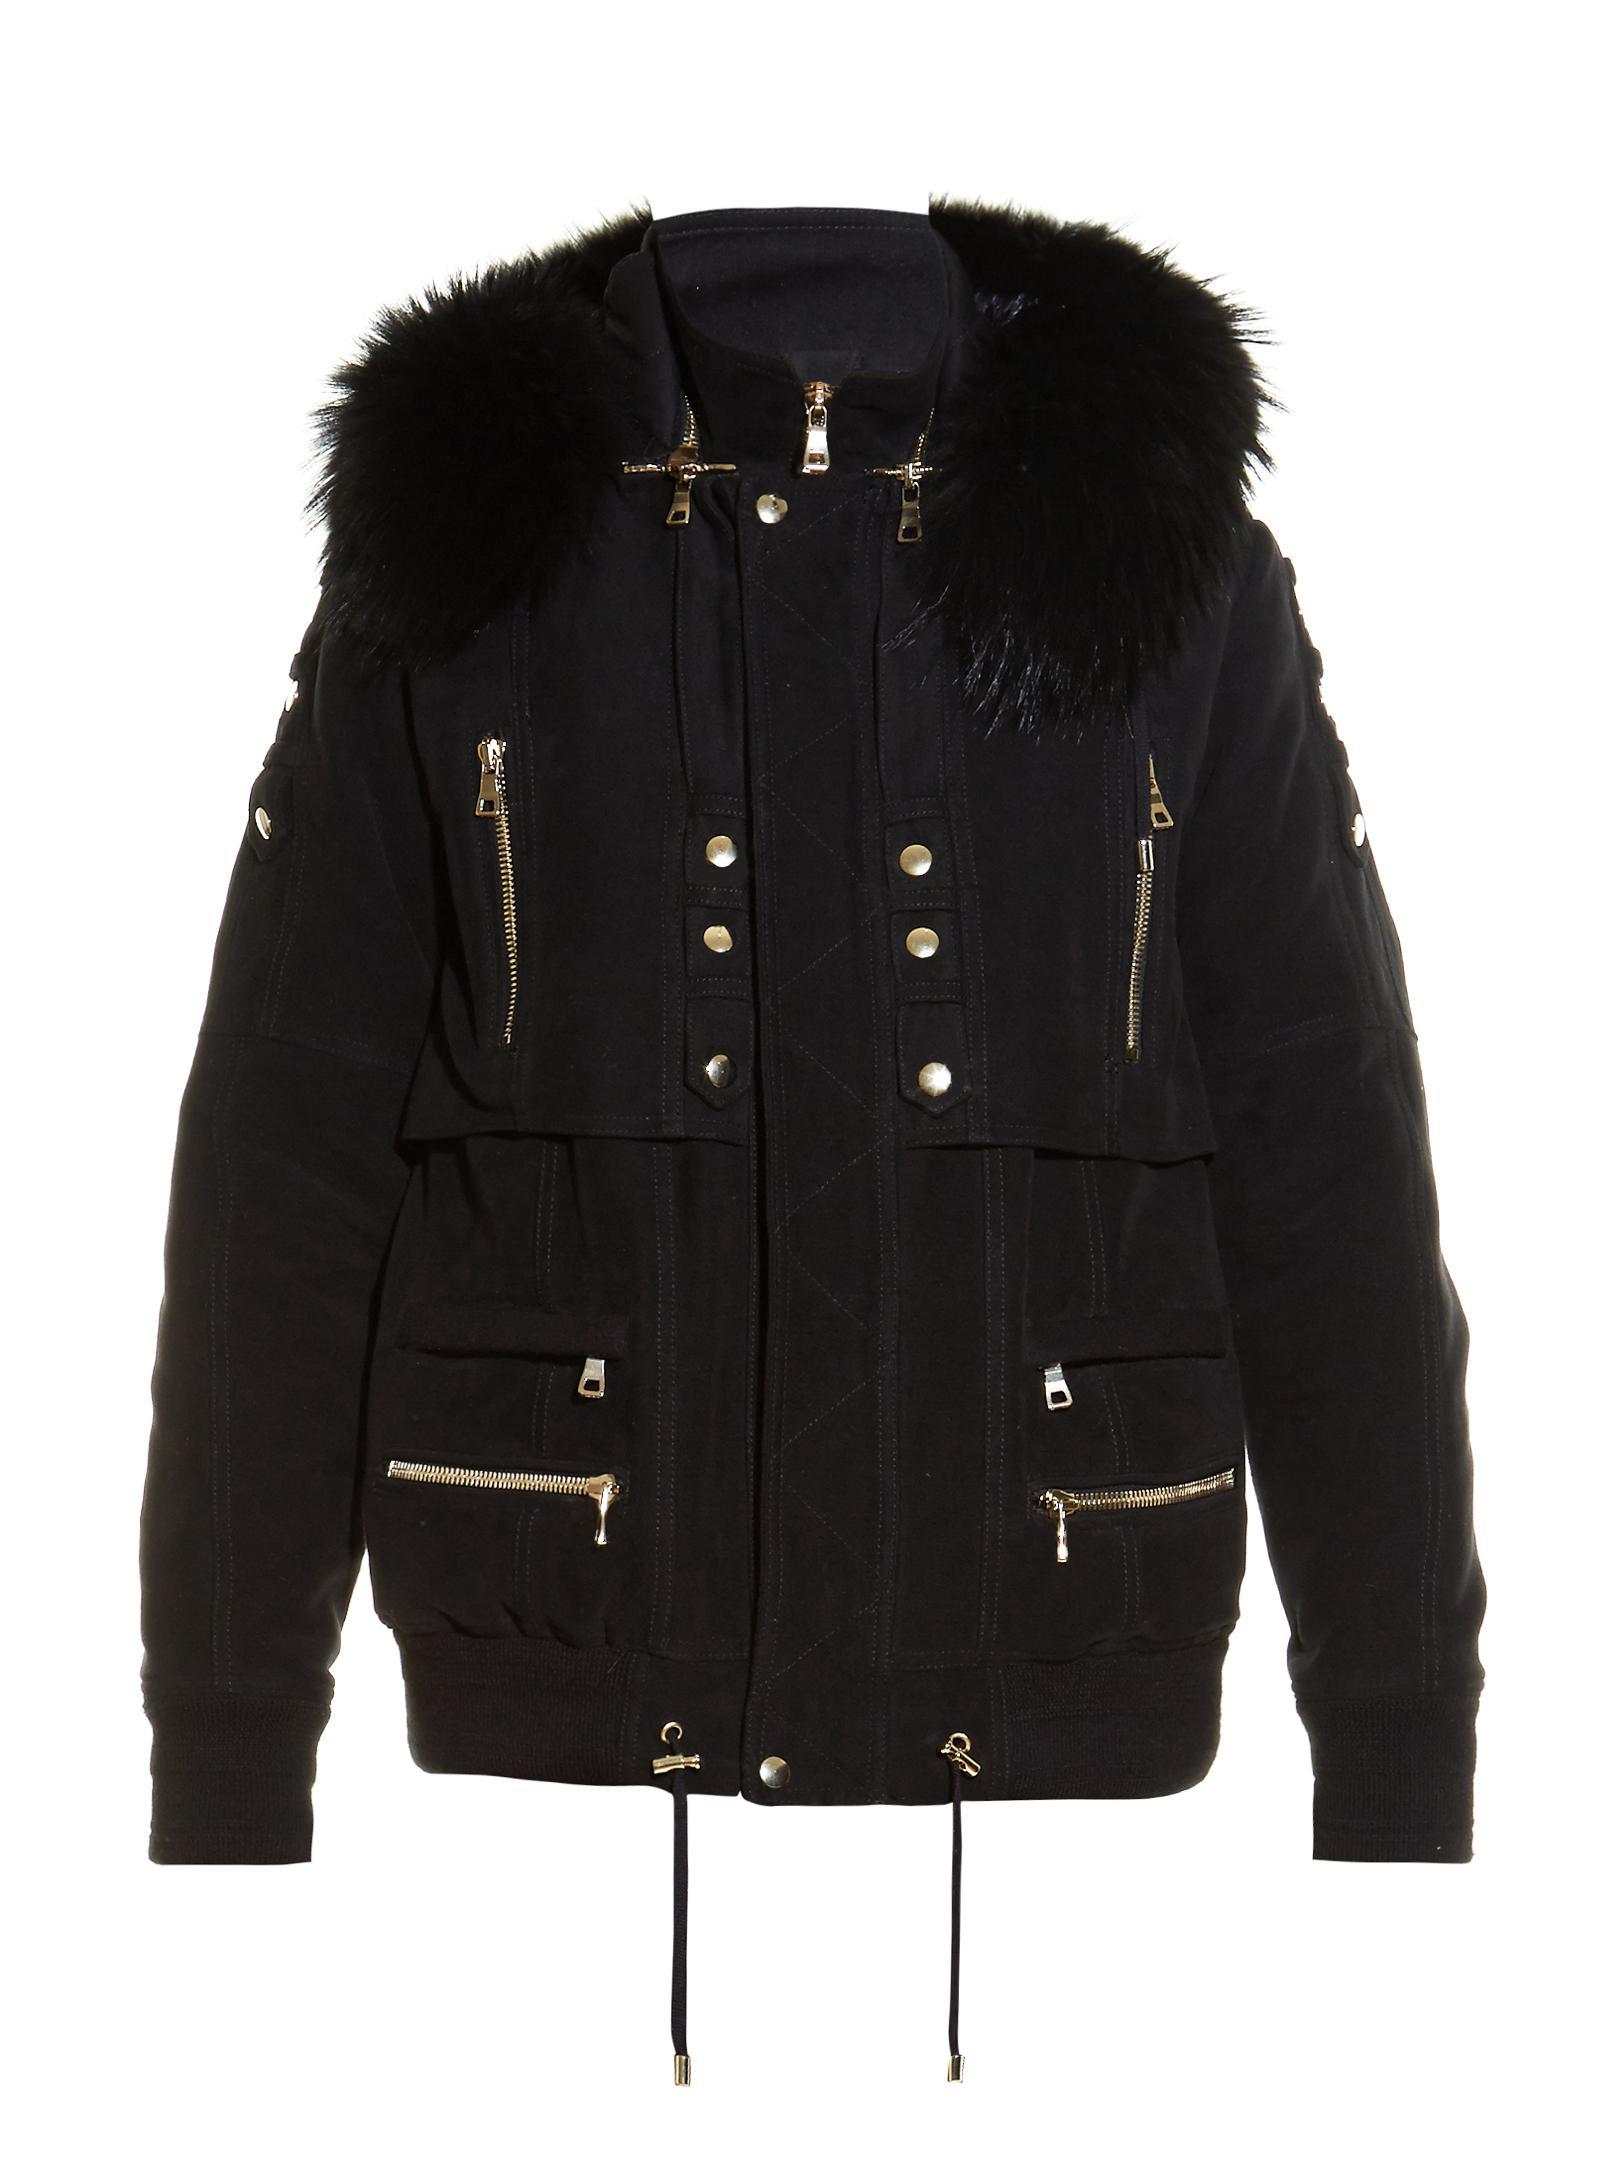 Lyst Balmain Fur Trim Hooded Parka Jacket In Black For Men